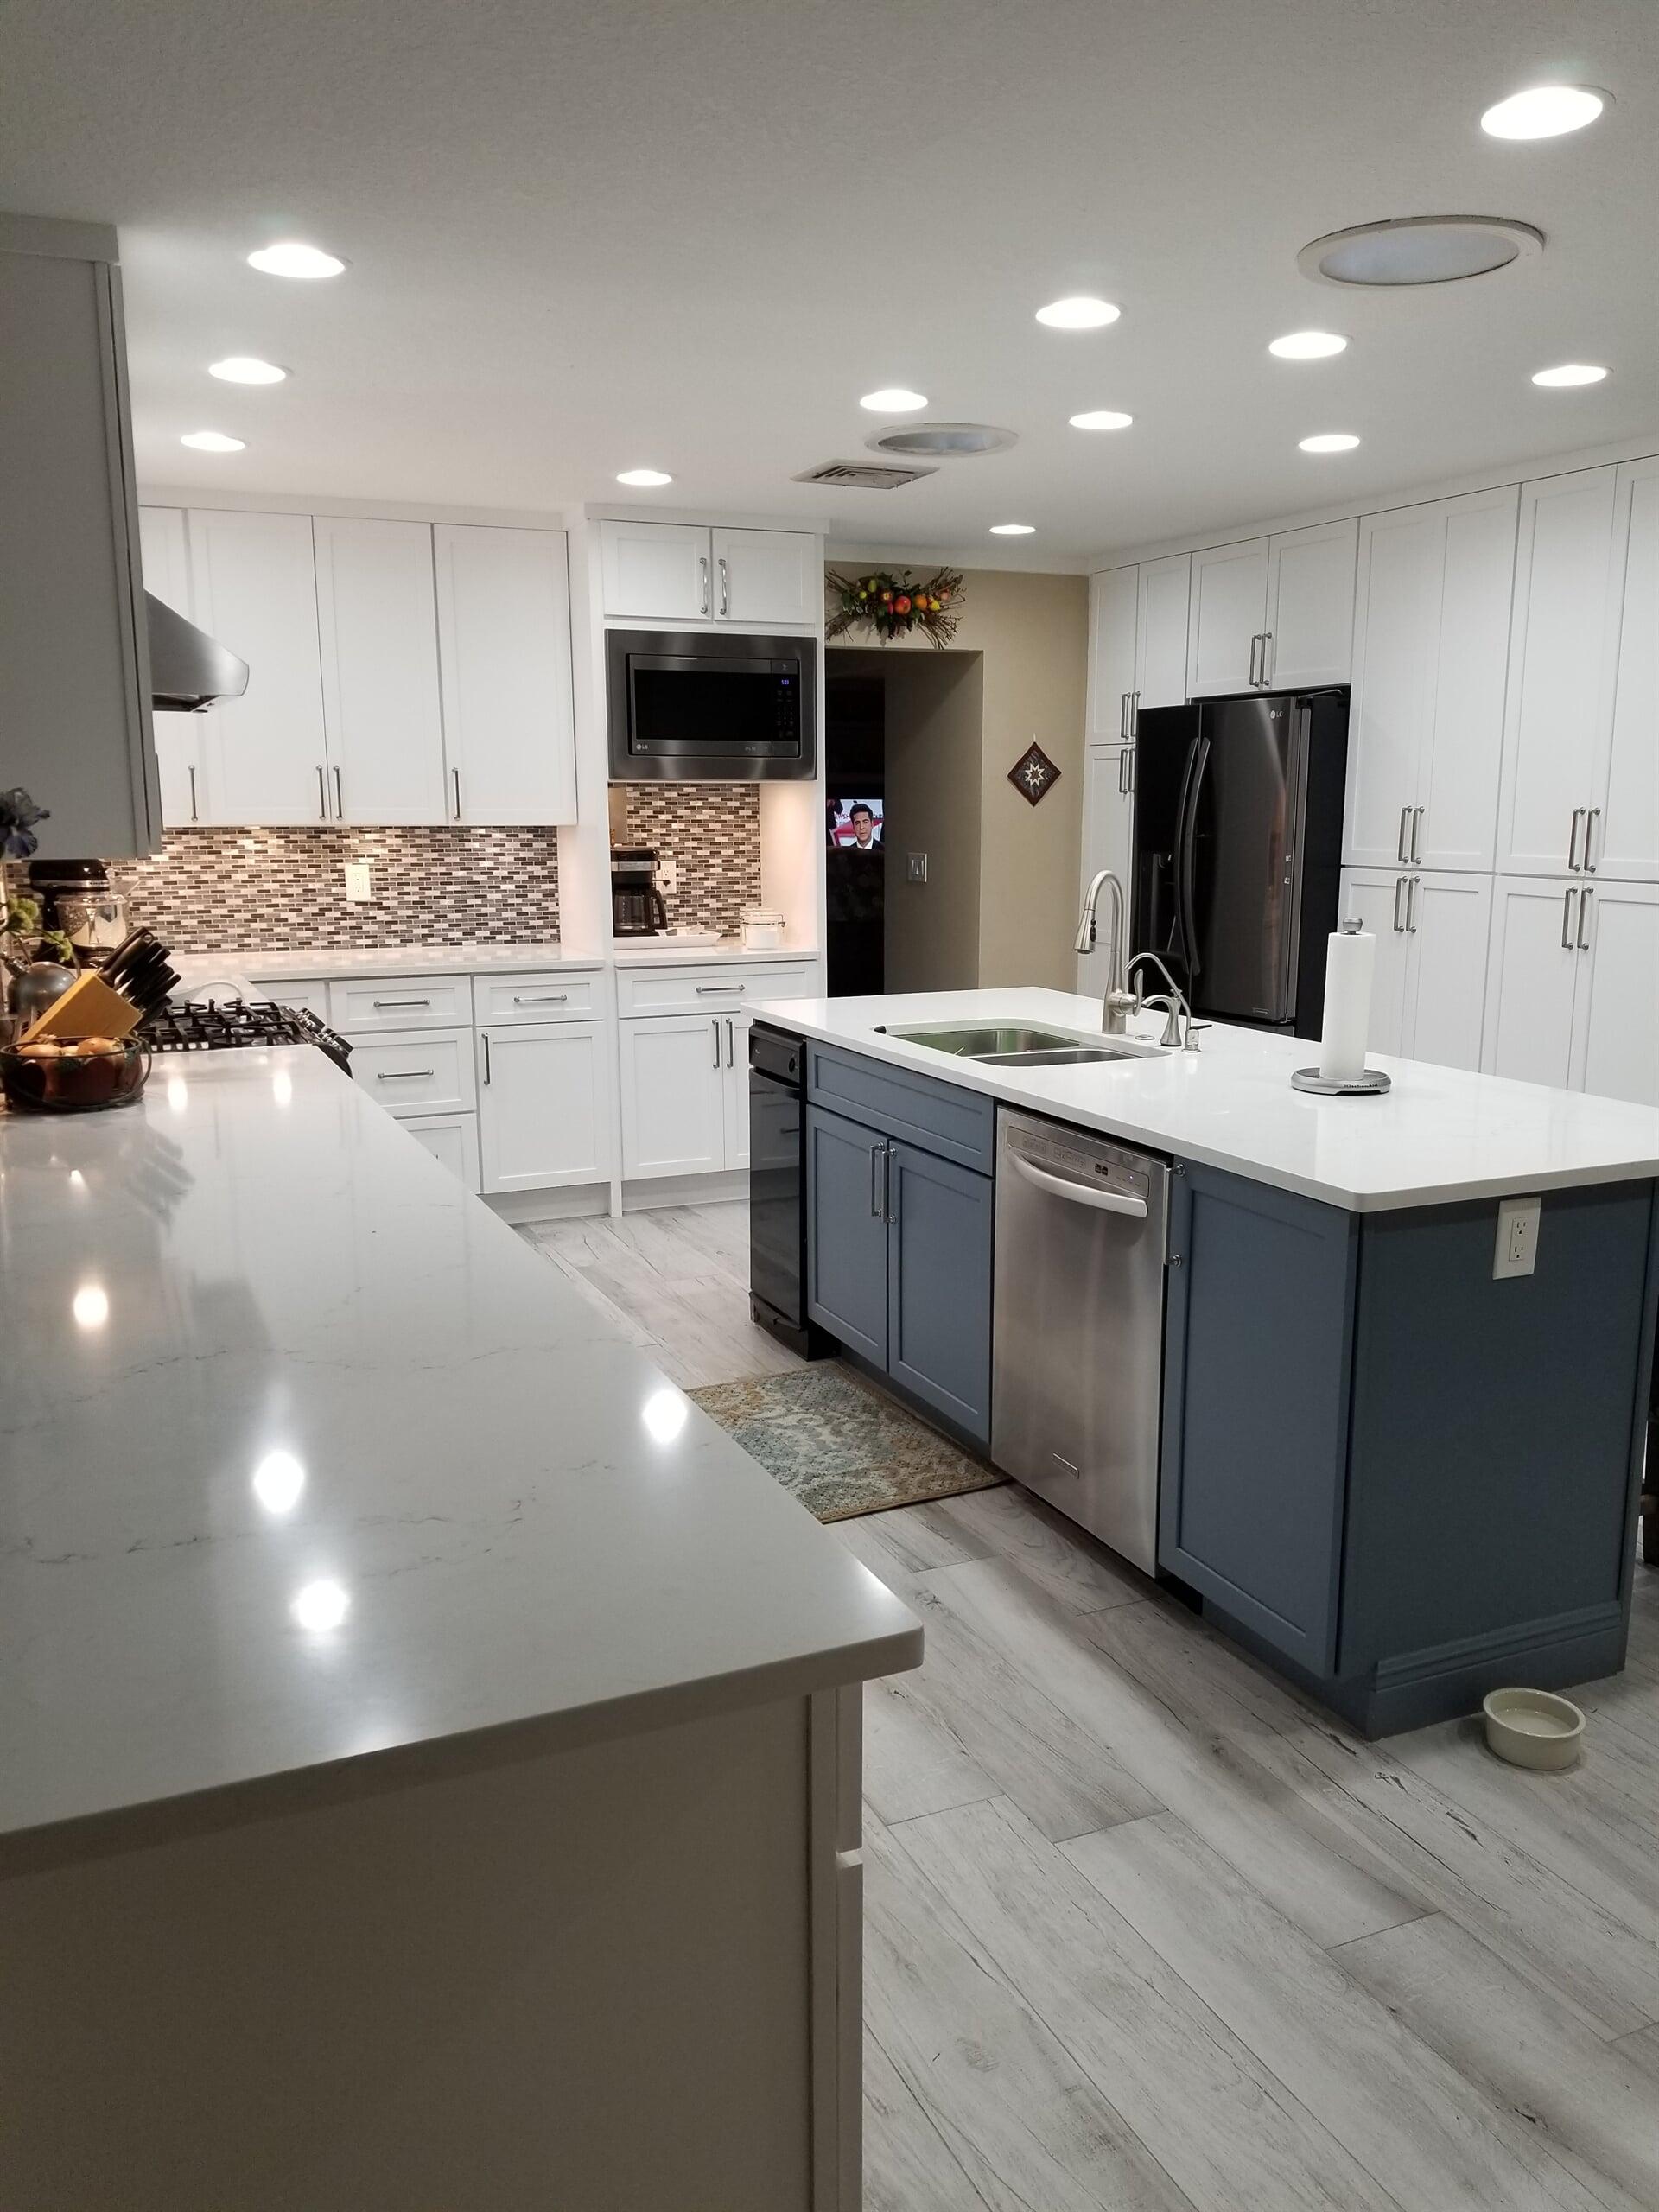 White stone countertop in Port Saint Lucie, FL from Agler Kitchen, Bath & Floors